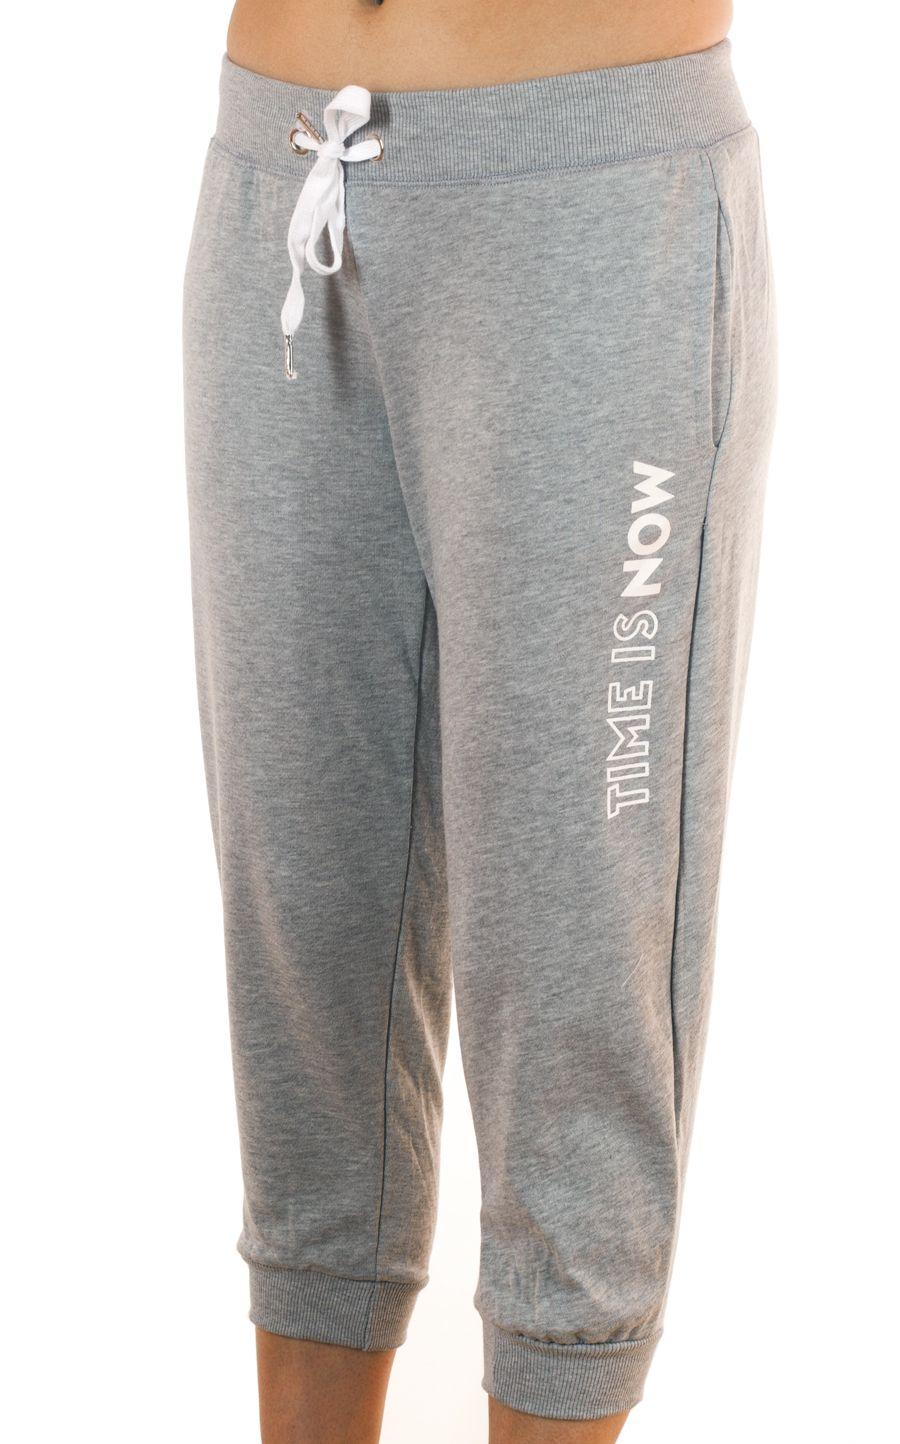 Женские брюки капри  Coco Limon для фитнес - вид спереди